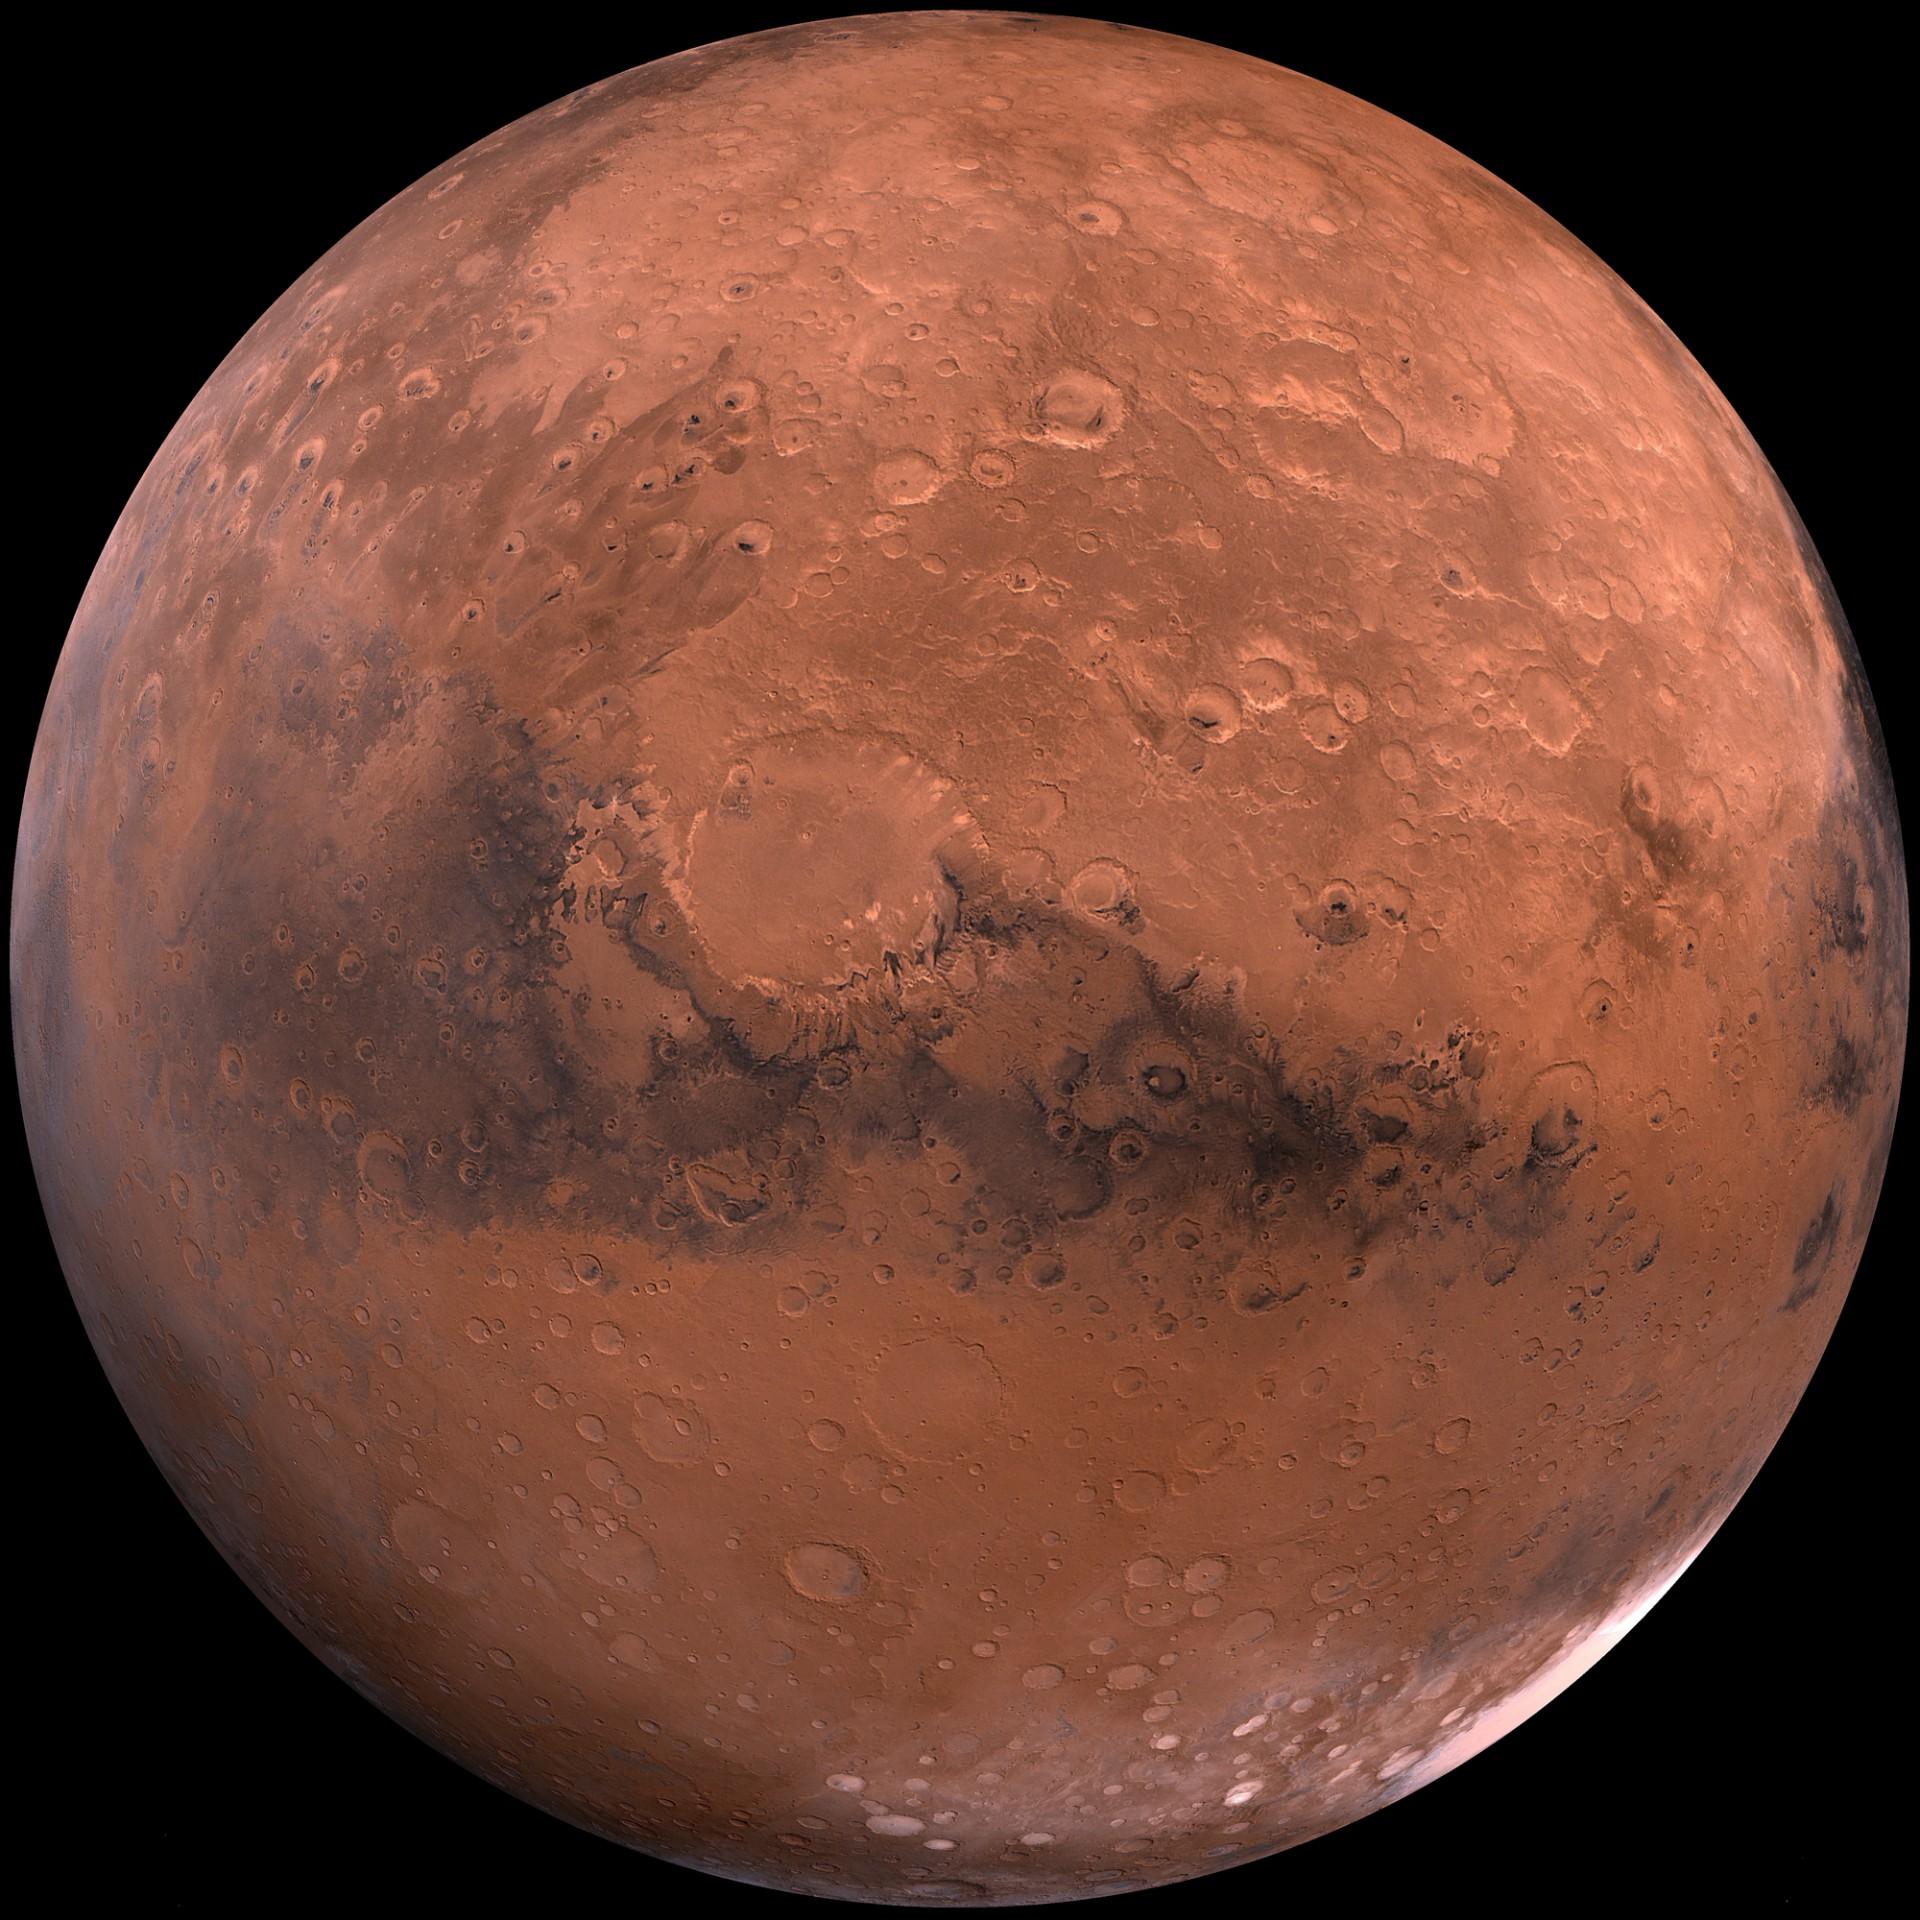 Zhurong explored Mars